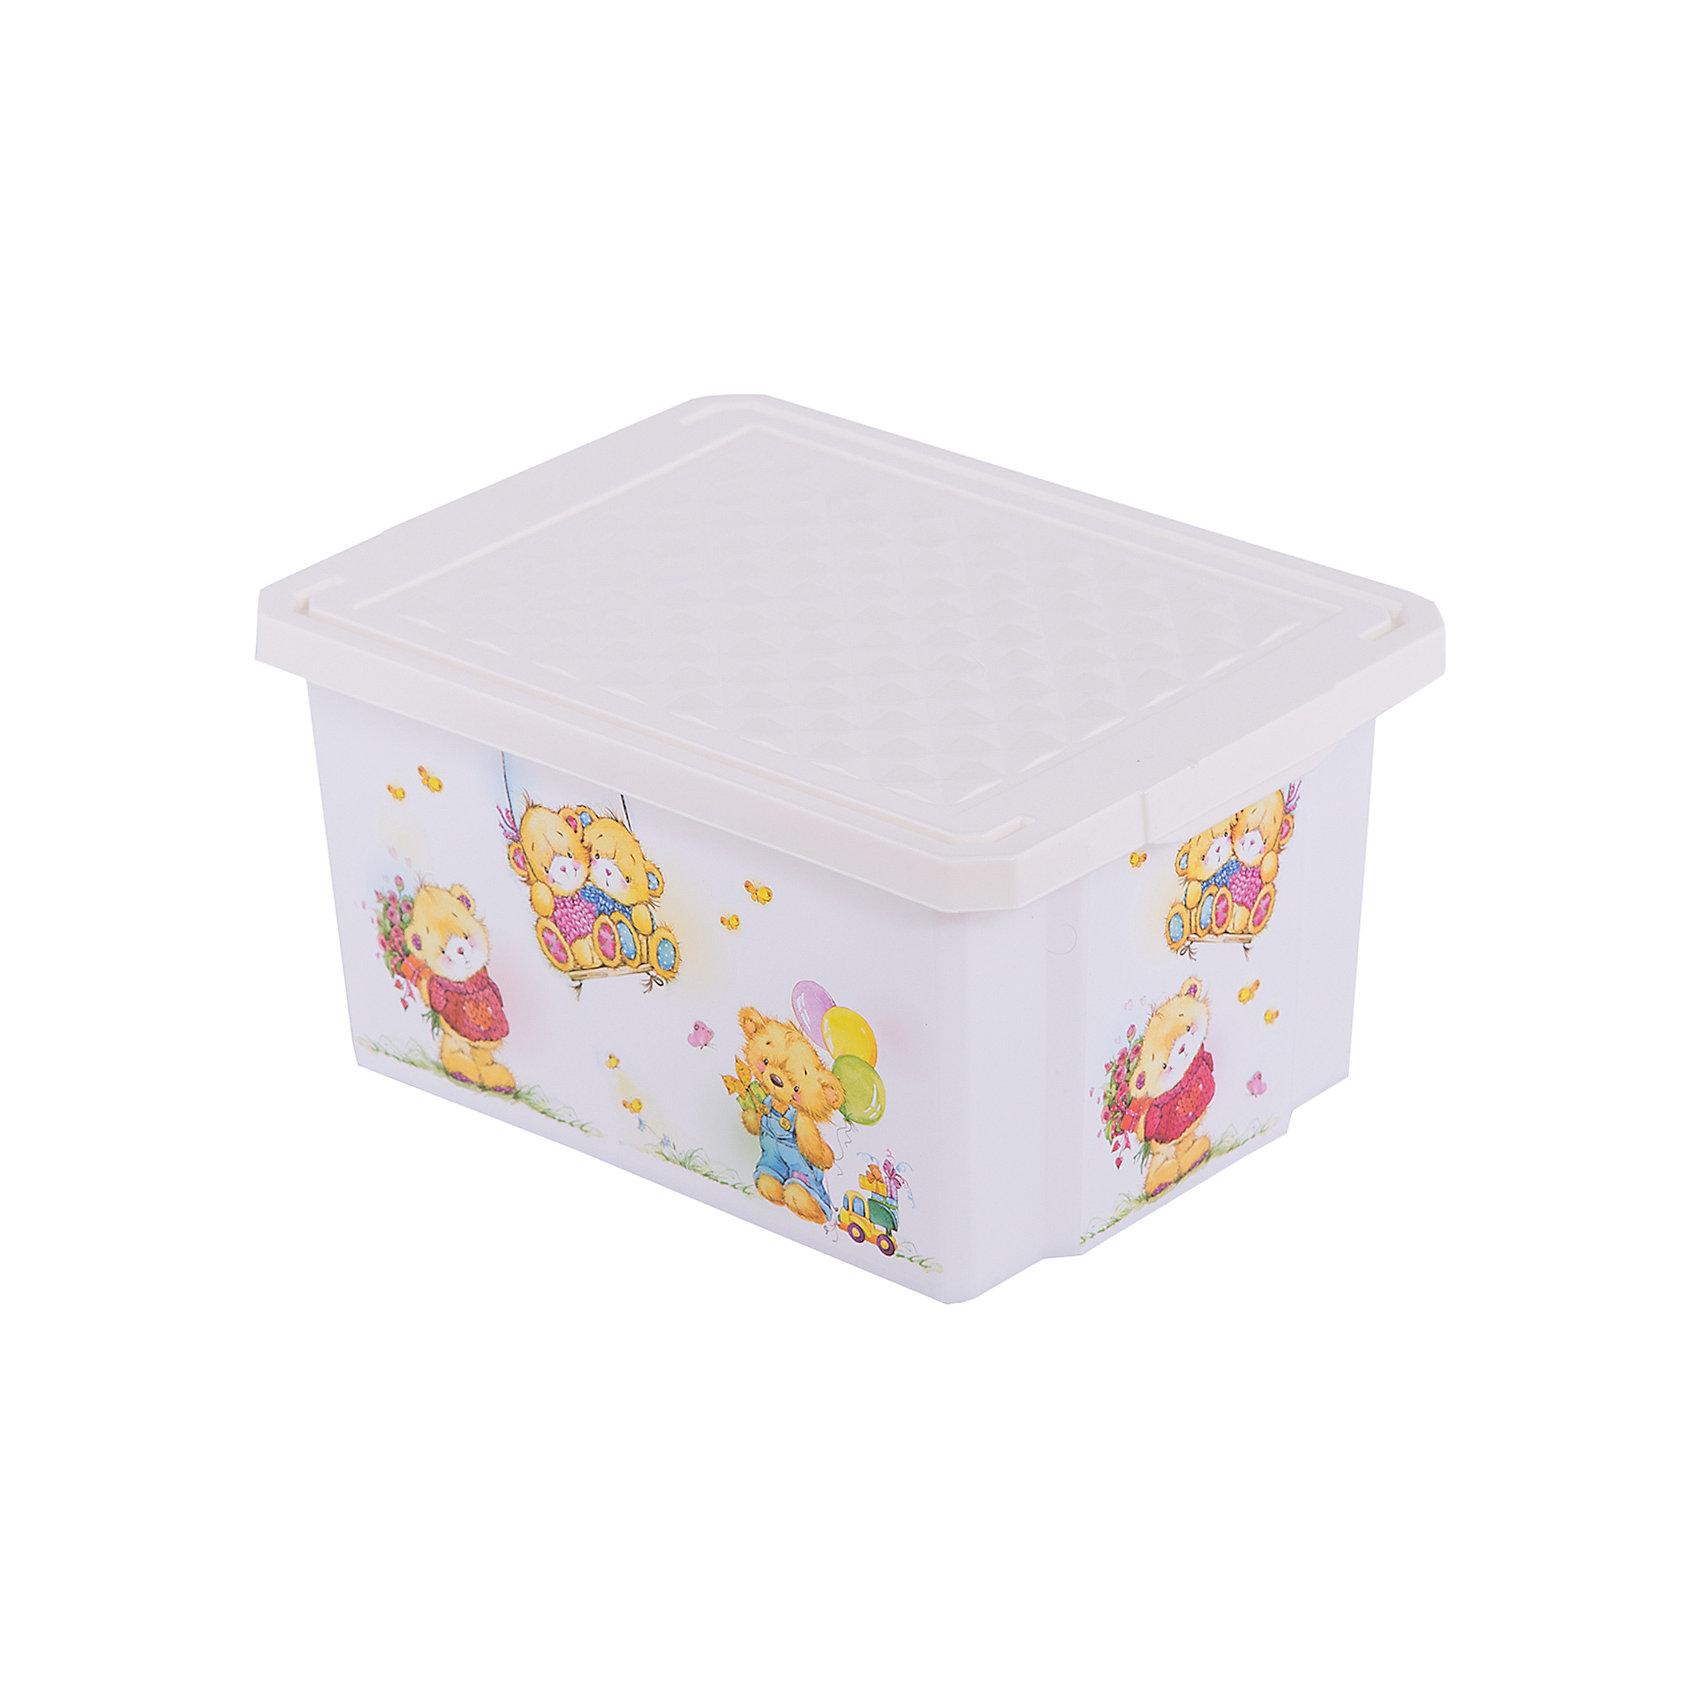 Little Angel Ящик для хранения игрушек X-BOX Bears 17л, Little Angel, слоновая кость little angel мусорная корзина круглая 7 л city cars little angel голубой